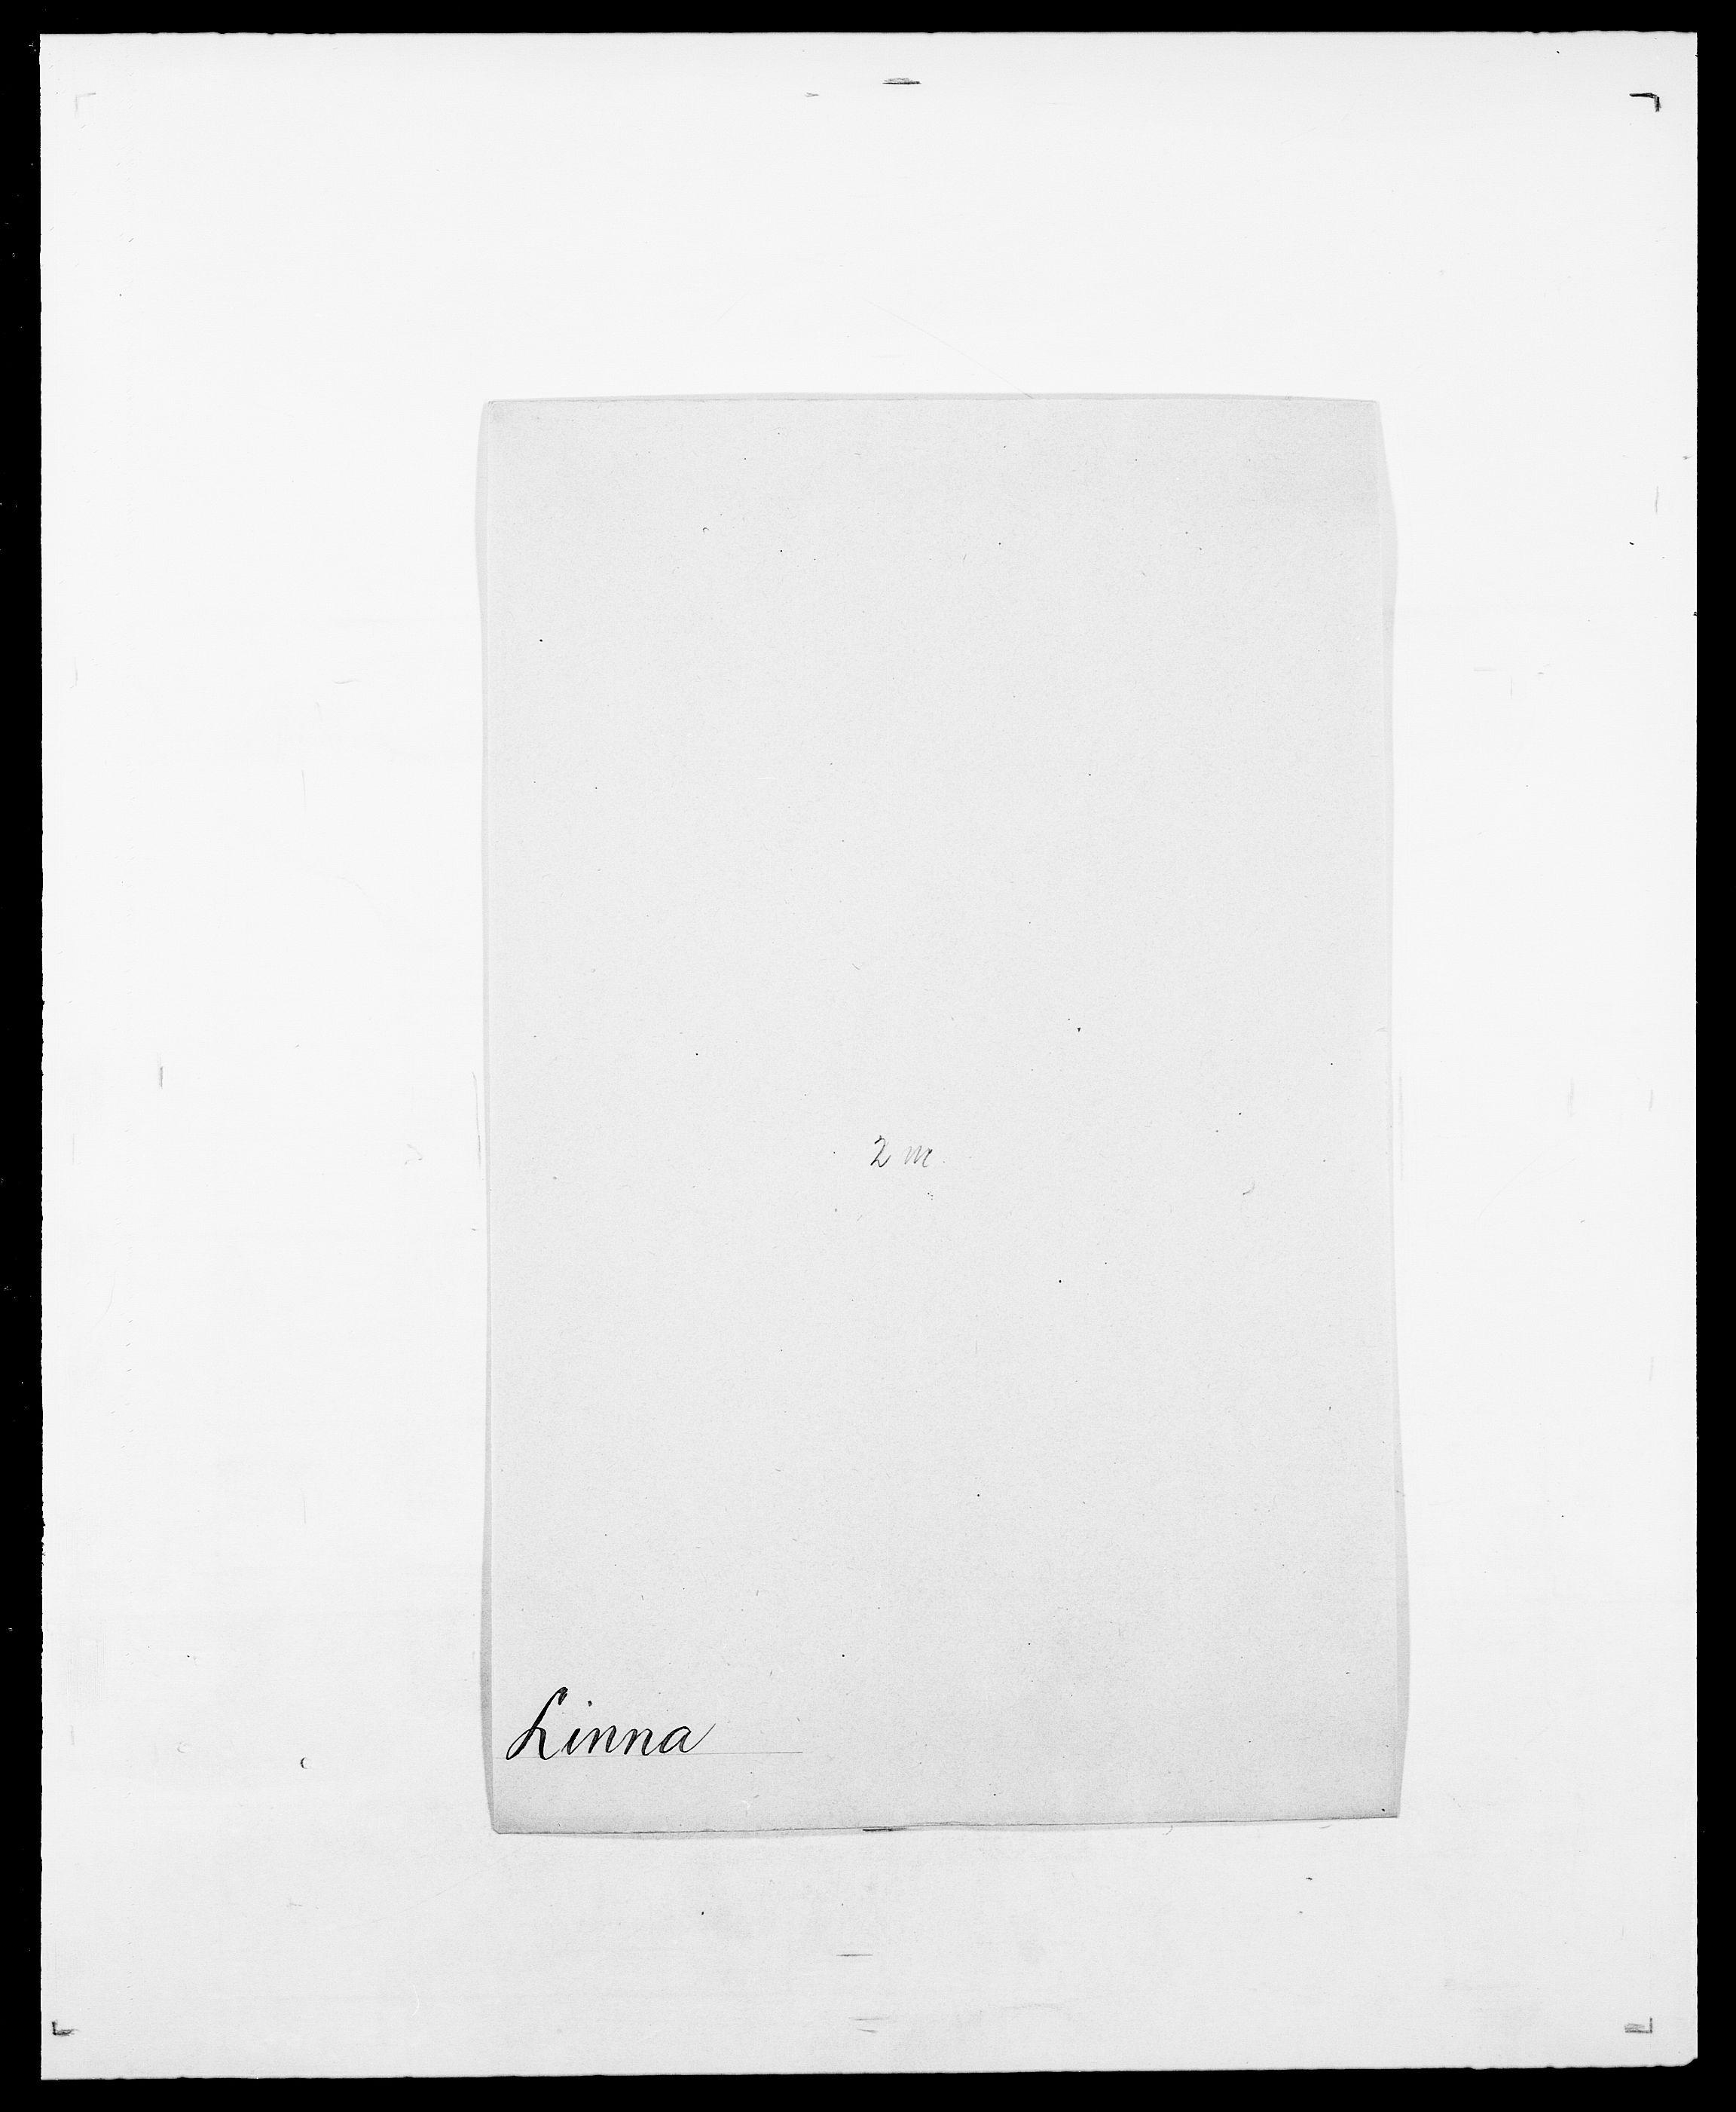 SAO, Delgobe, Charles Antoine - samling, D/Da/L0023: Lau - Lirvyn, s. 641